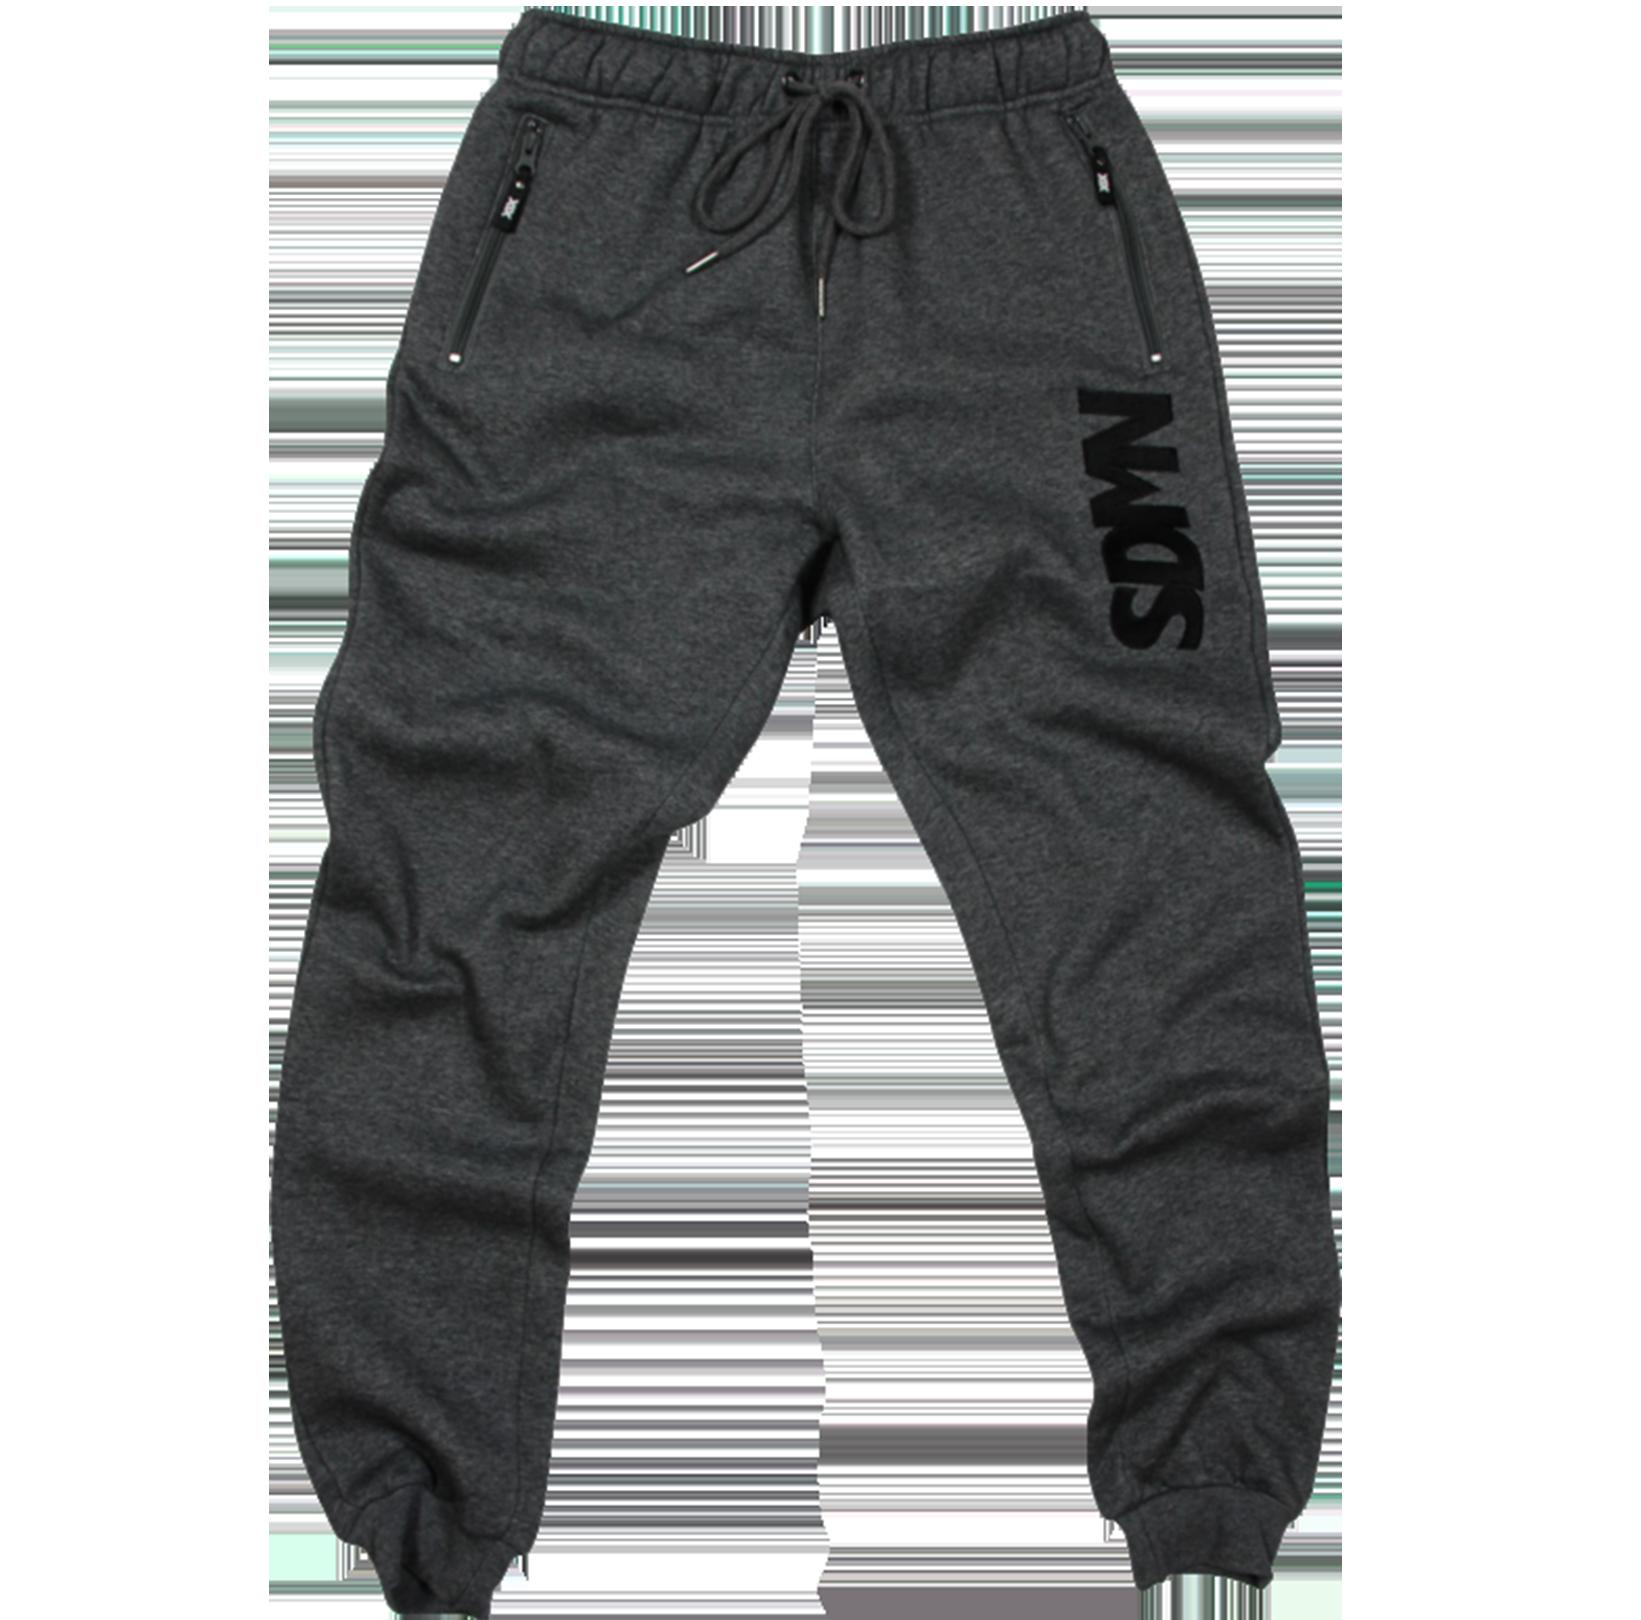 Pants clipart tracksuit pants. Sidemen track png v